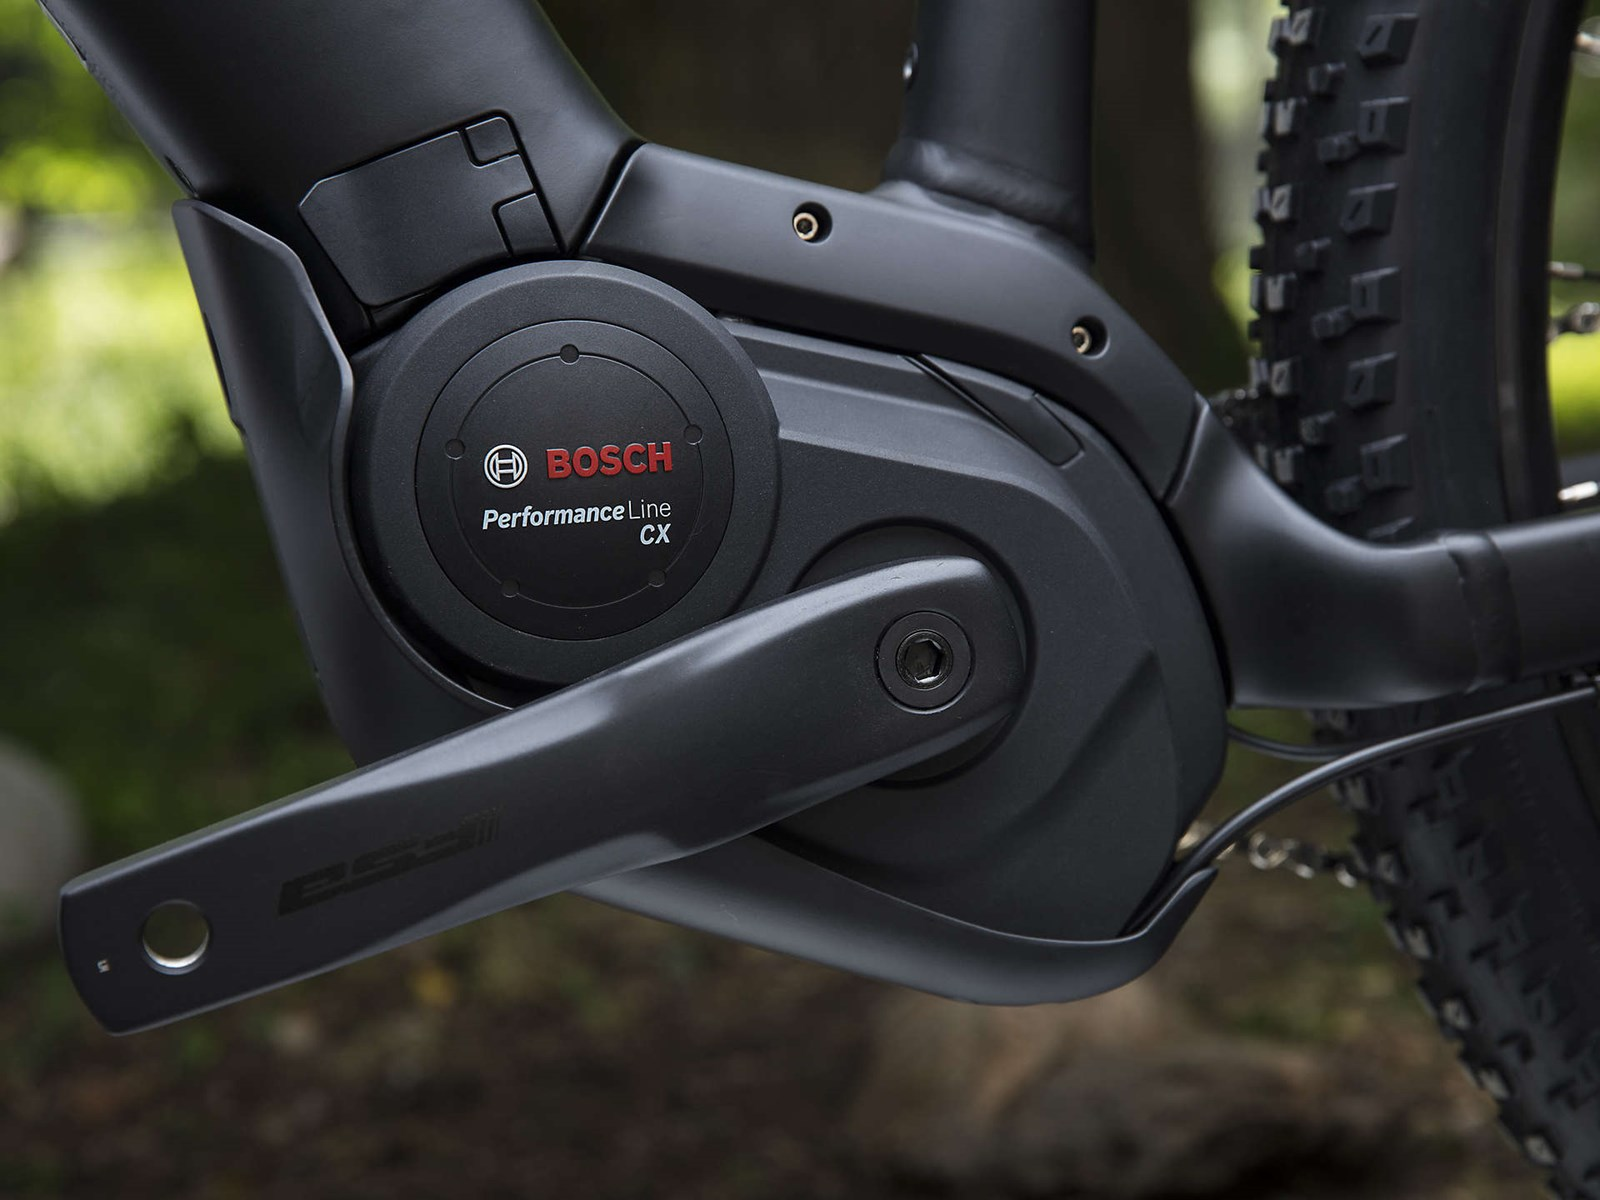 add1cfc6b5a Trek Powerfly 5 Electric Hardtail MTB 2019 - Black £3